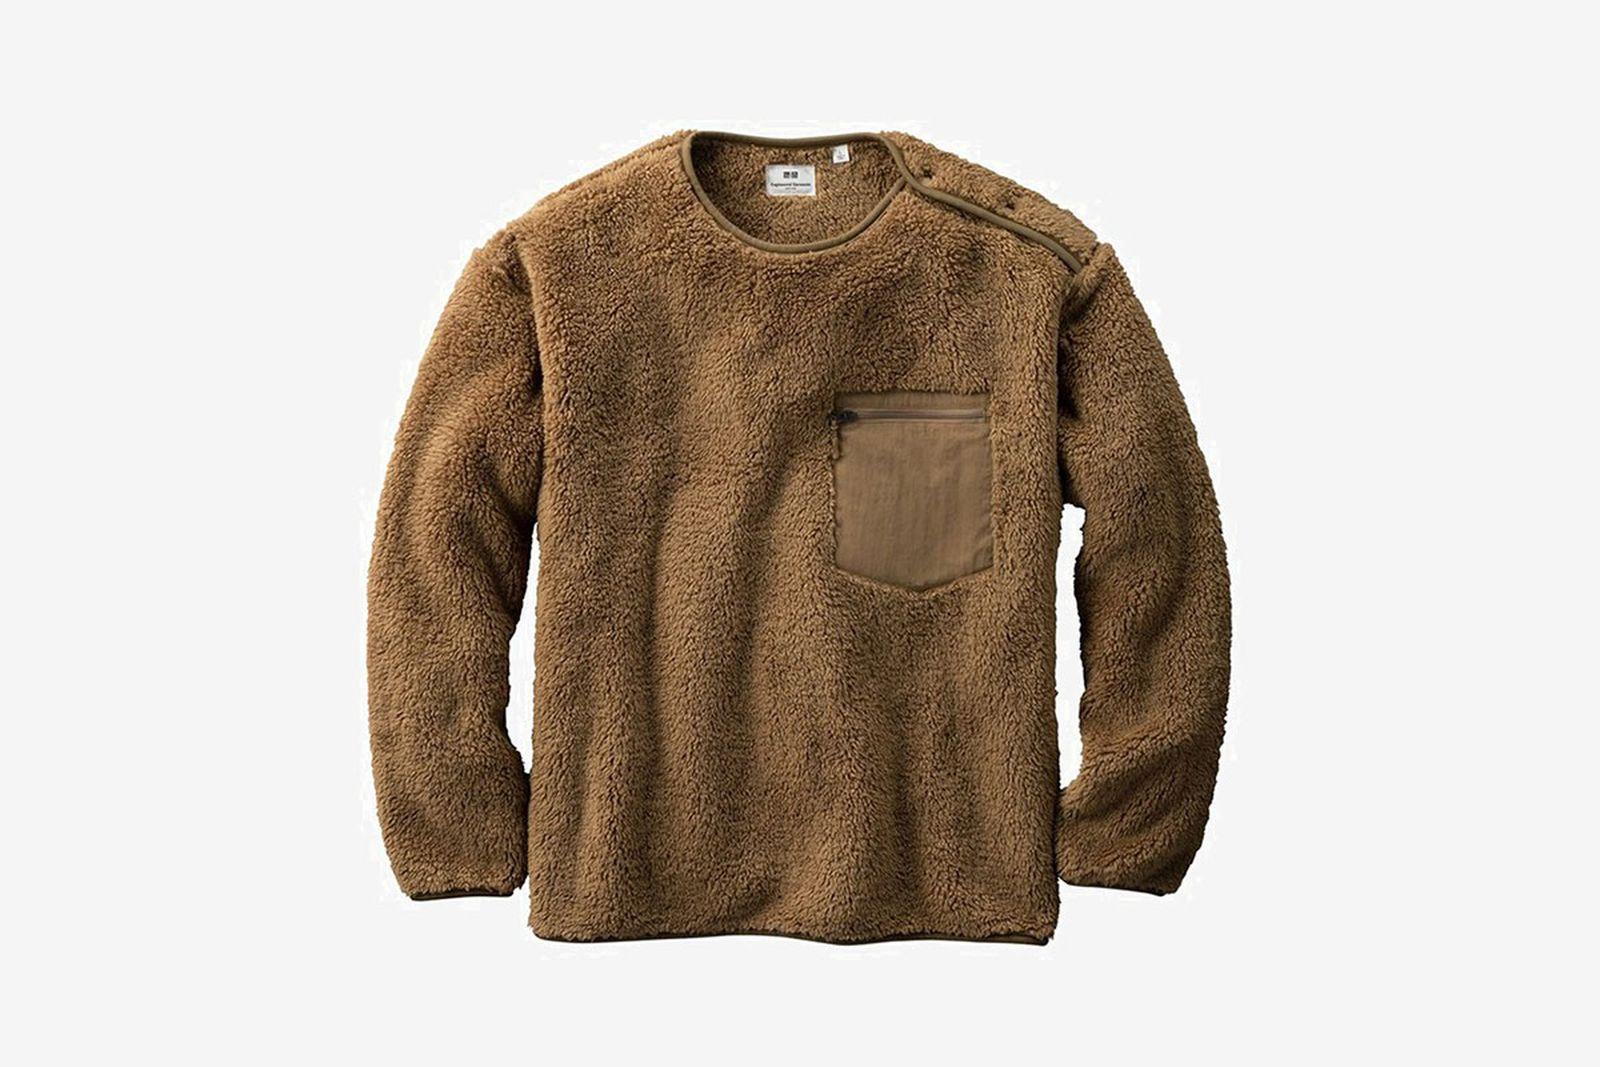 uniqlo engineered garments